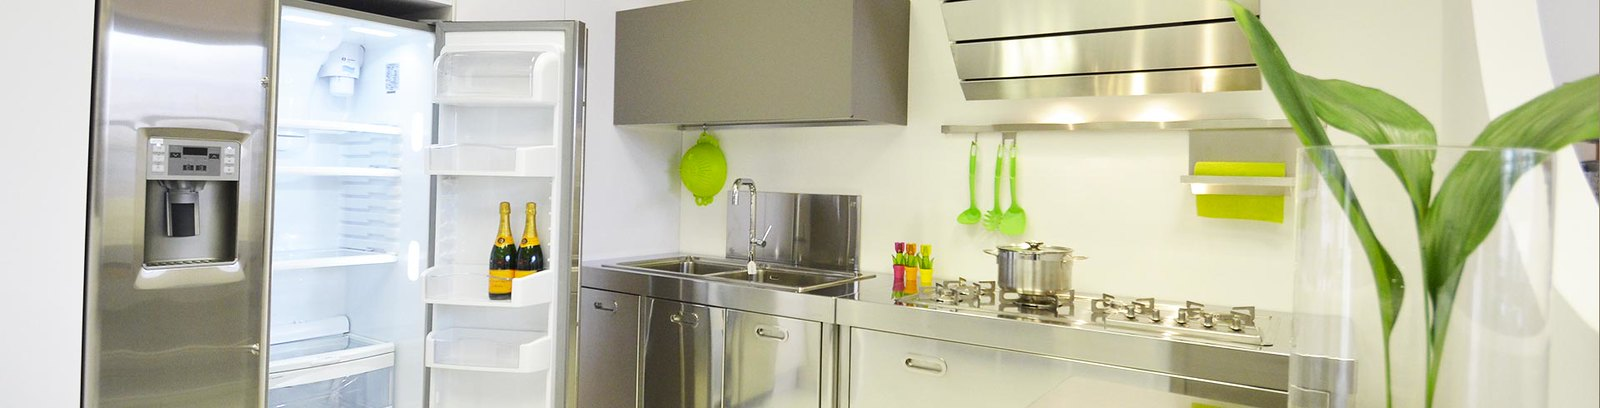 Ricambi accessori cucina categoria ricambi originali e - Ricambi cucine ariston ...